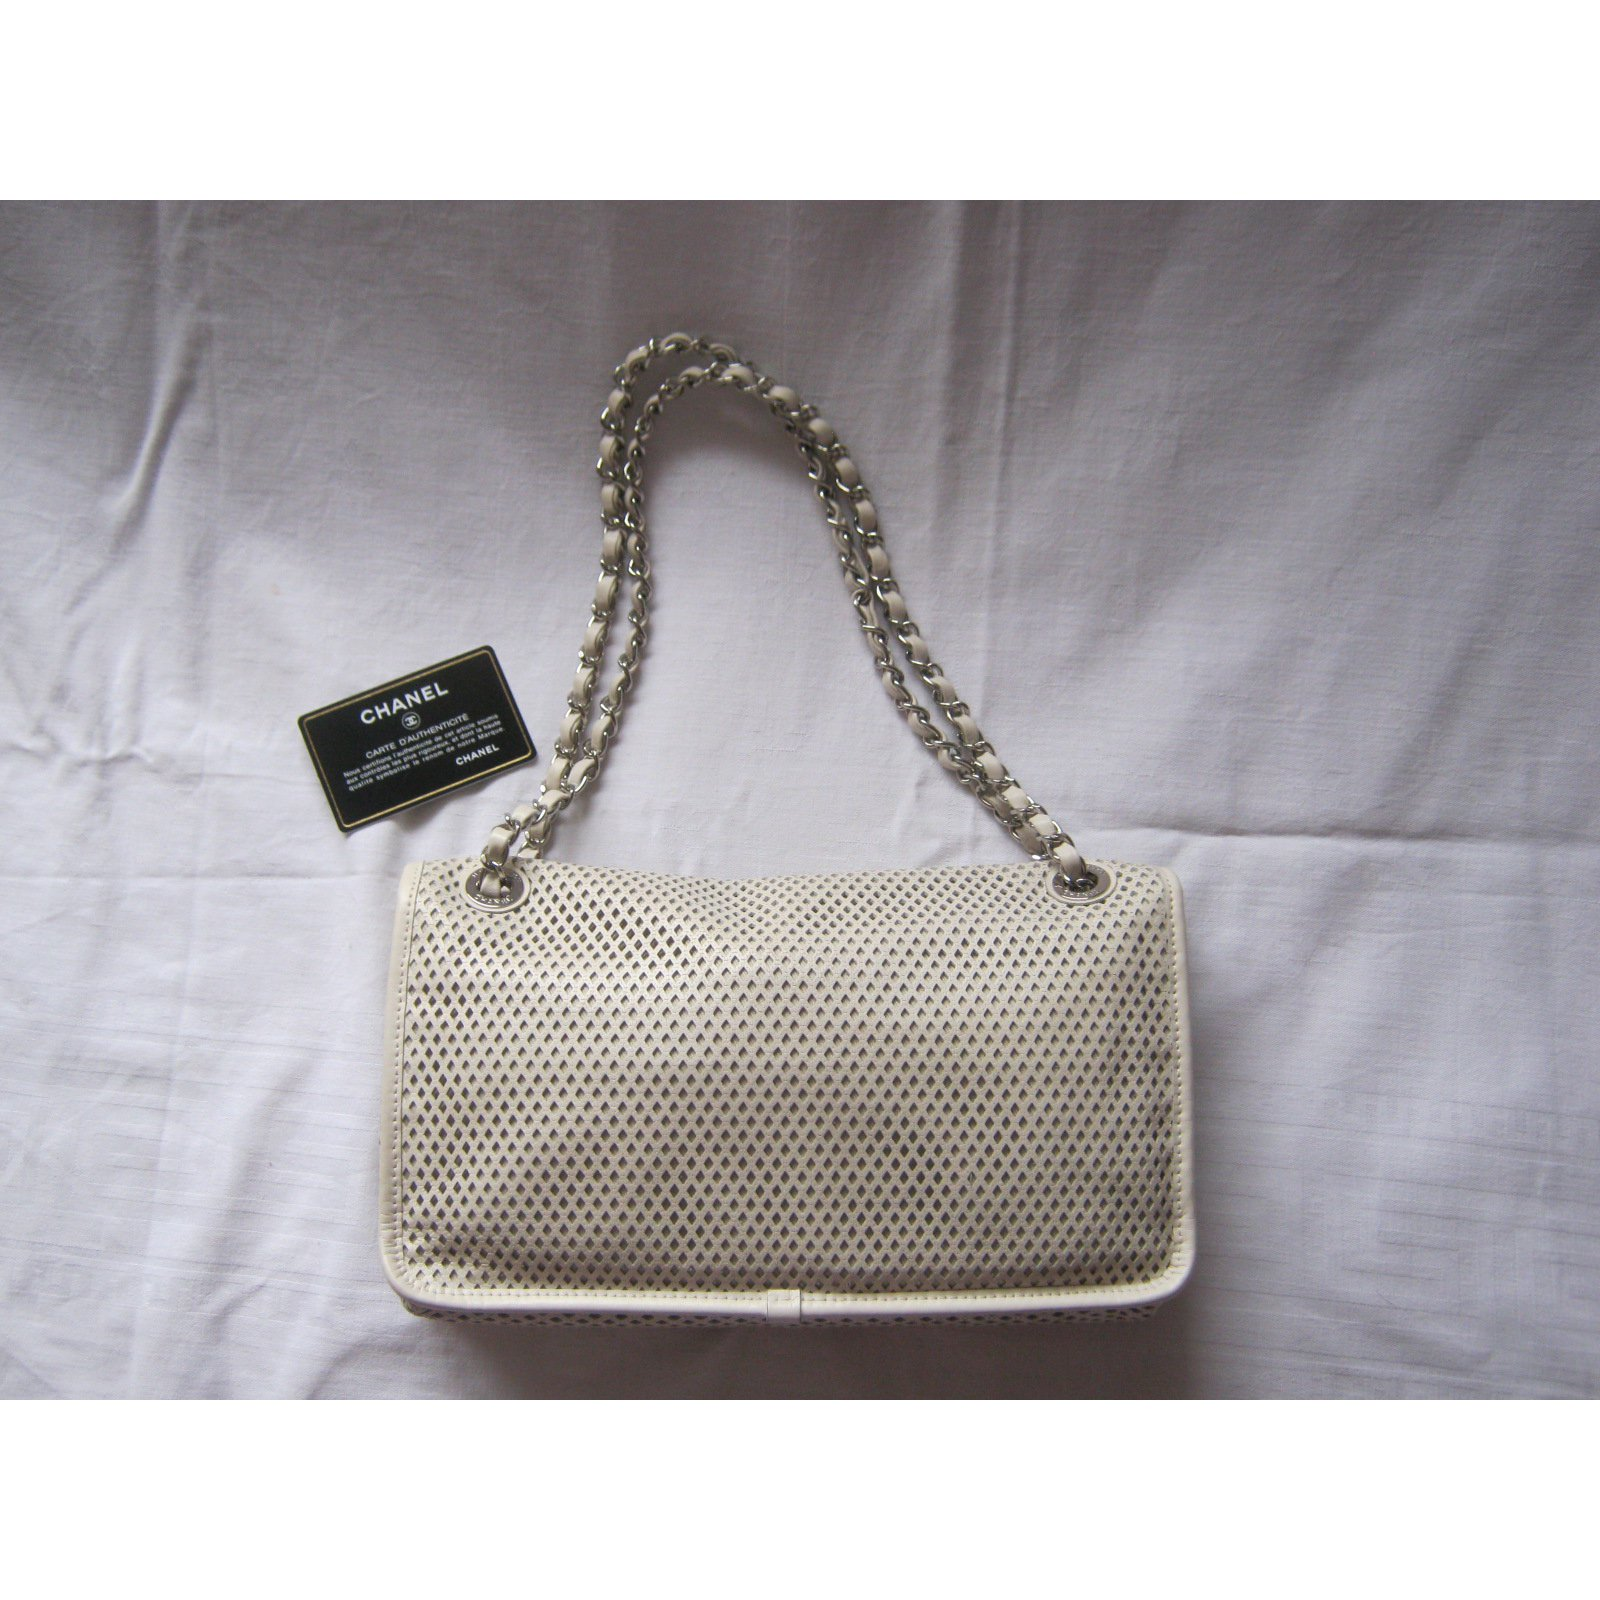 a48167e553b Chanel French riviera Flap Bag Handbags Leather Cream ref.35431 - Joli  Closet